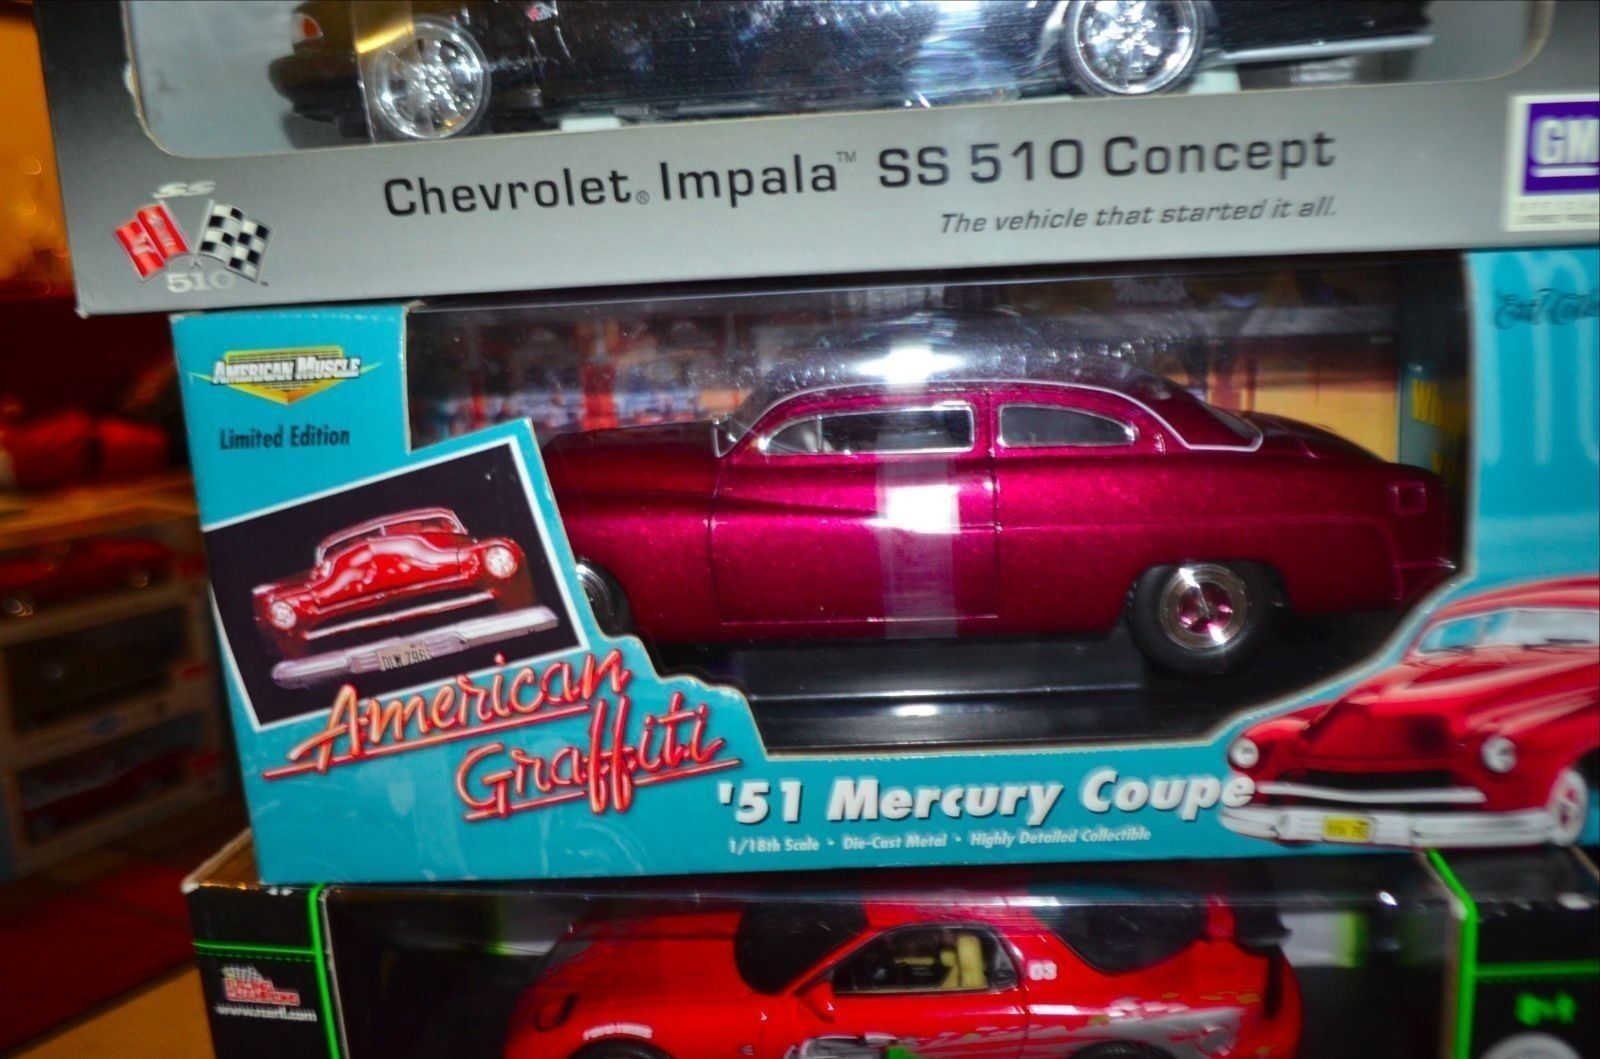 1 18 Ertl American Graffiti 1951 Mercury Coupe Limited Edition - Die Rare